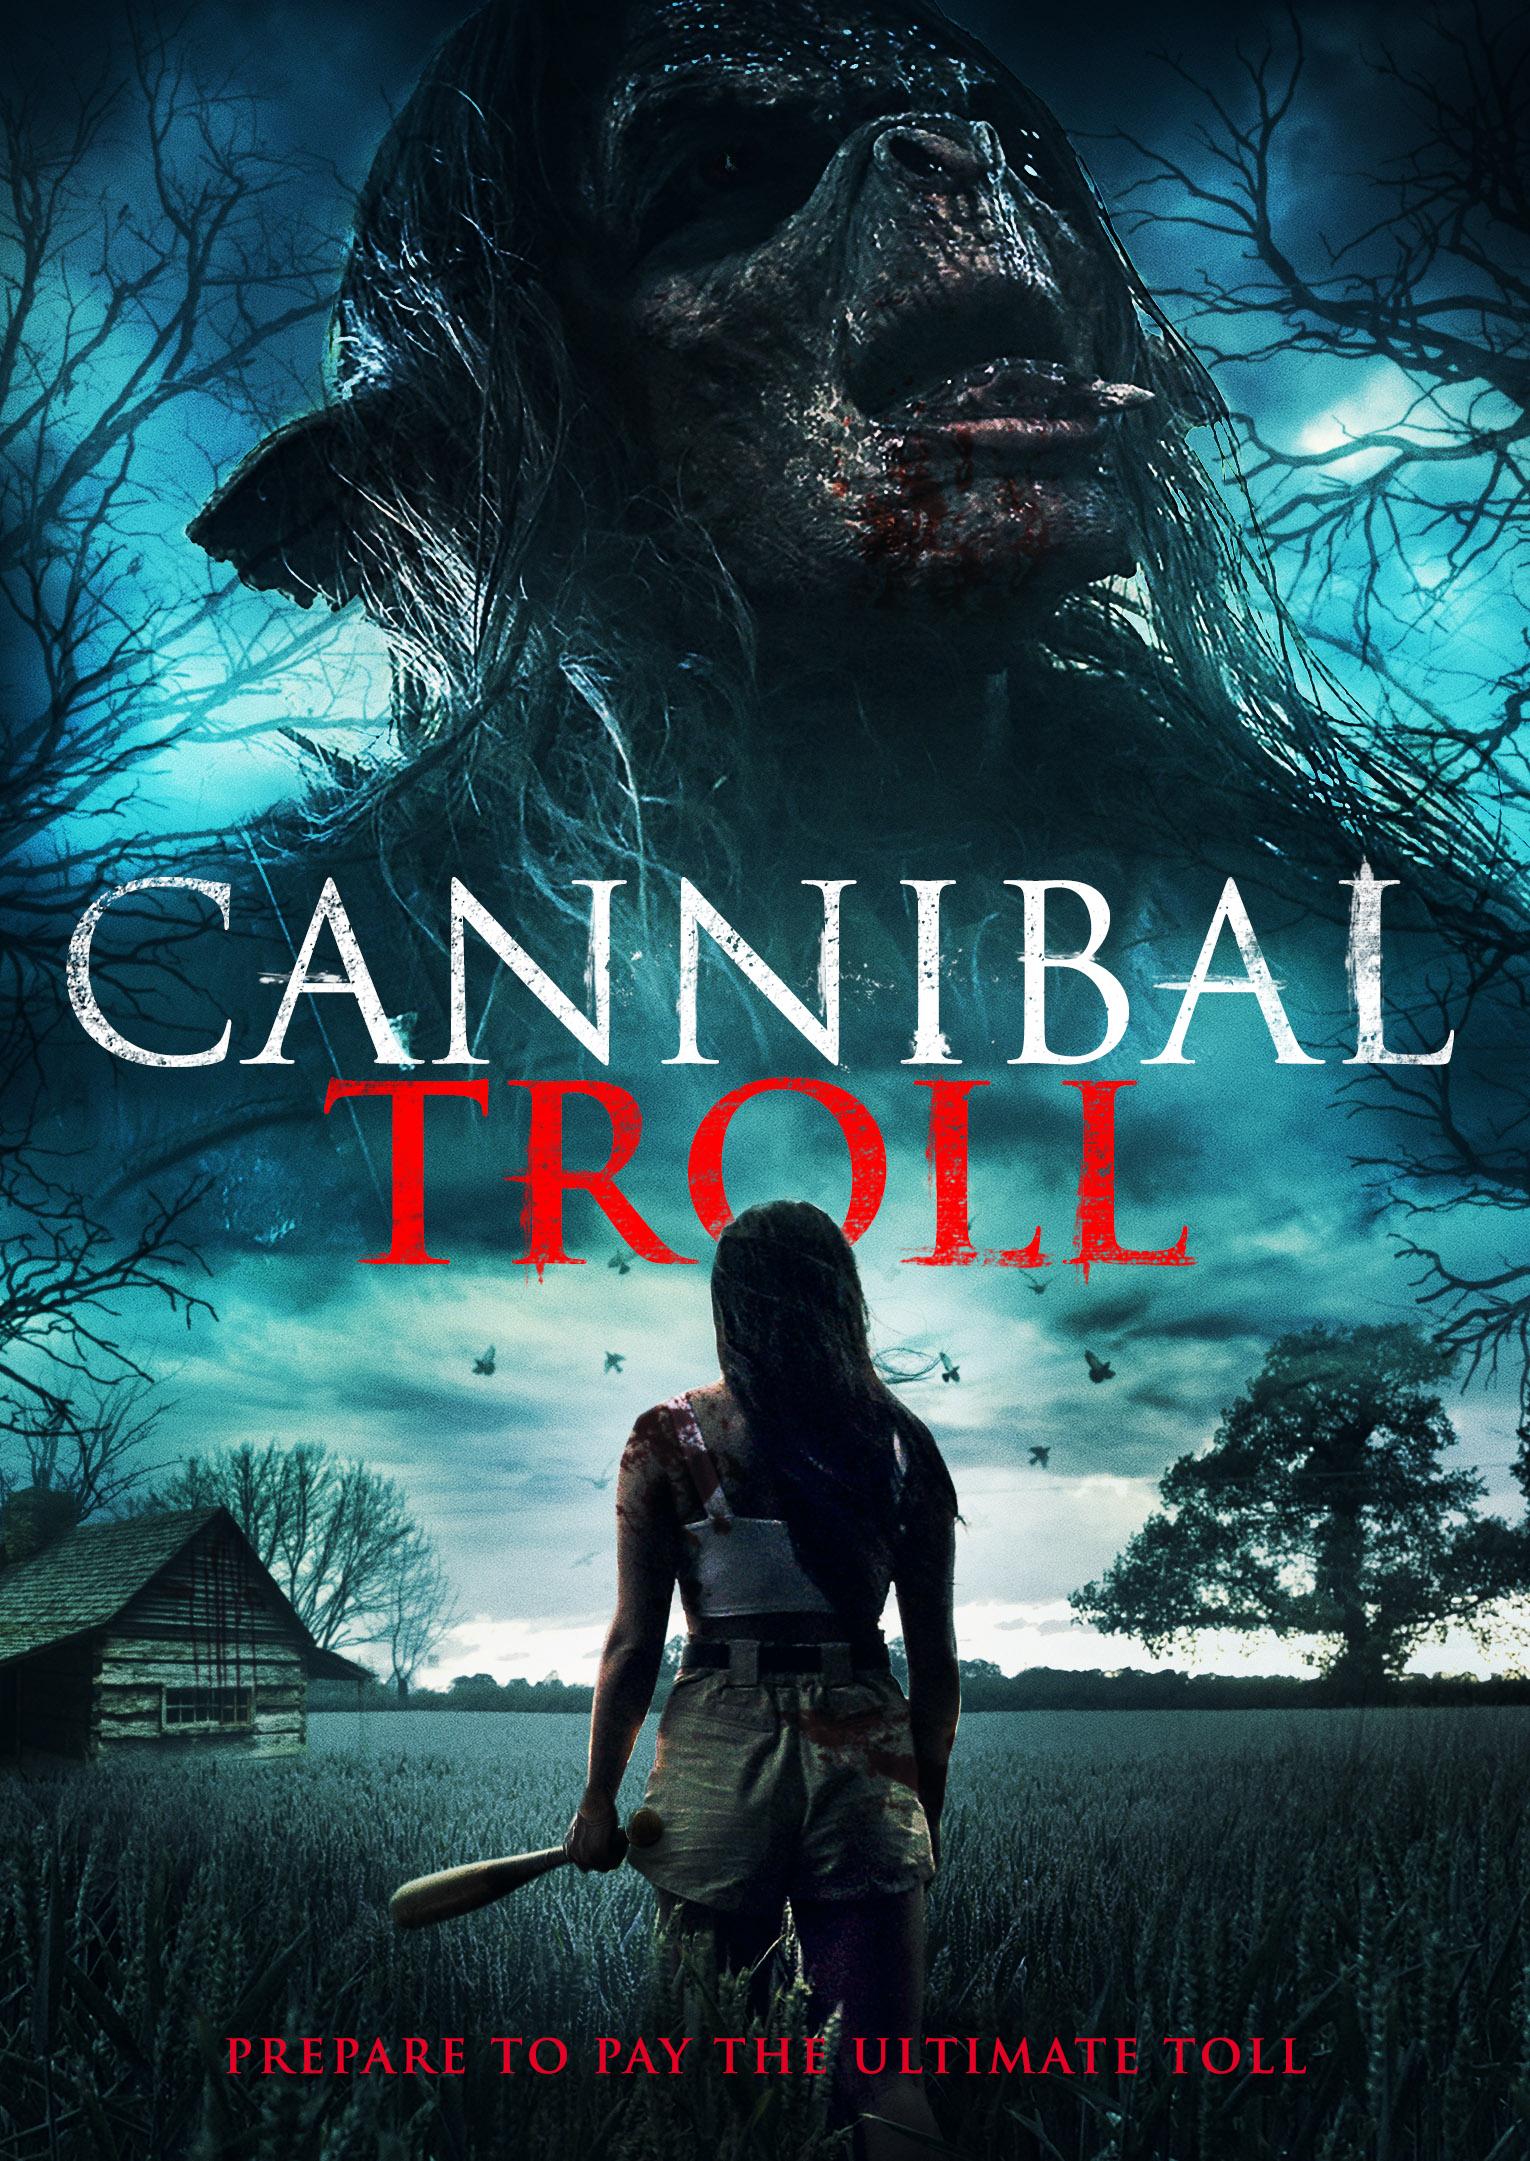 Cannibal Troll 2021 English 480p HDRip ESub 250MB Download